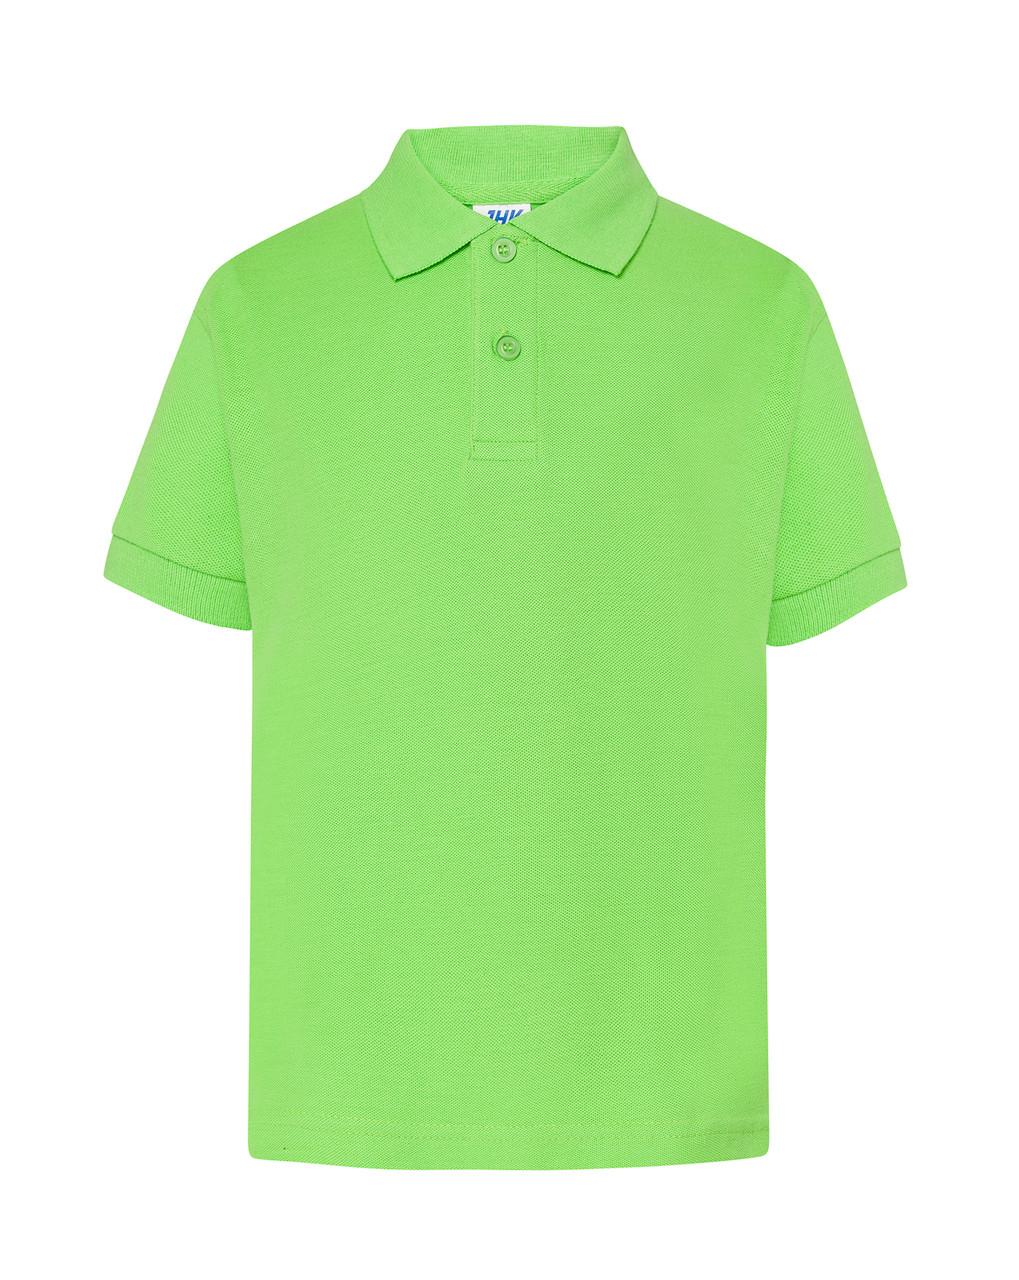 Детская футболка-поло JHK KID POLO цвет салатовый (LM)